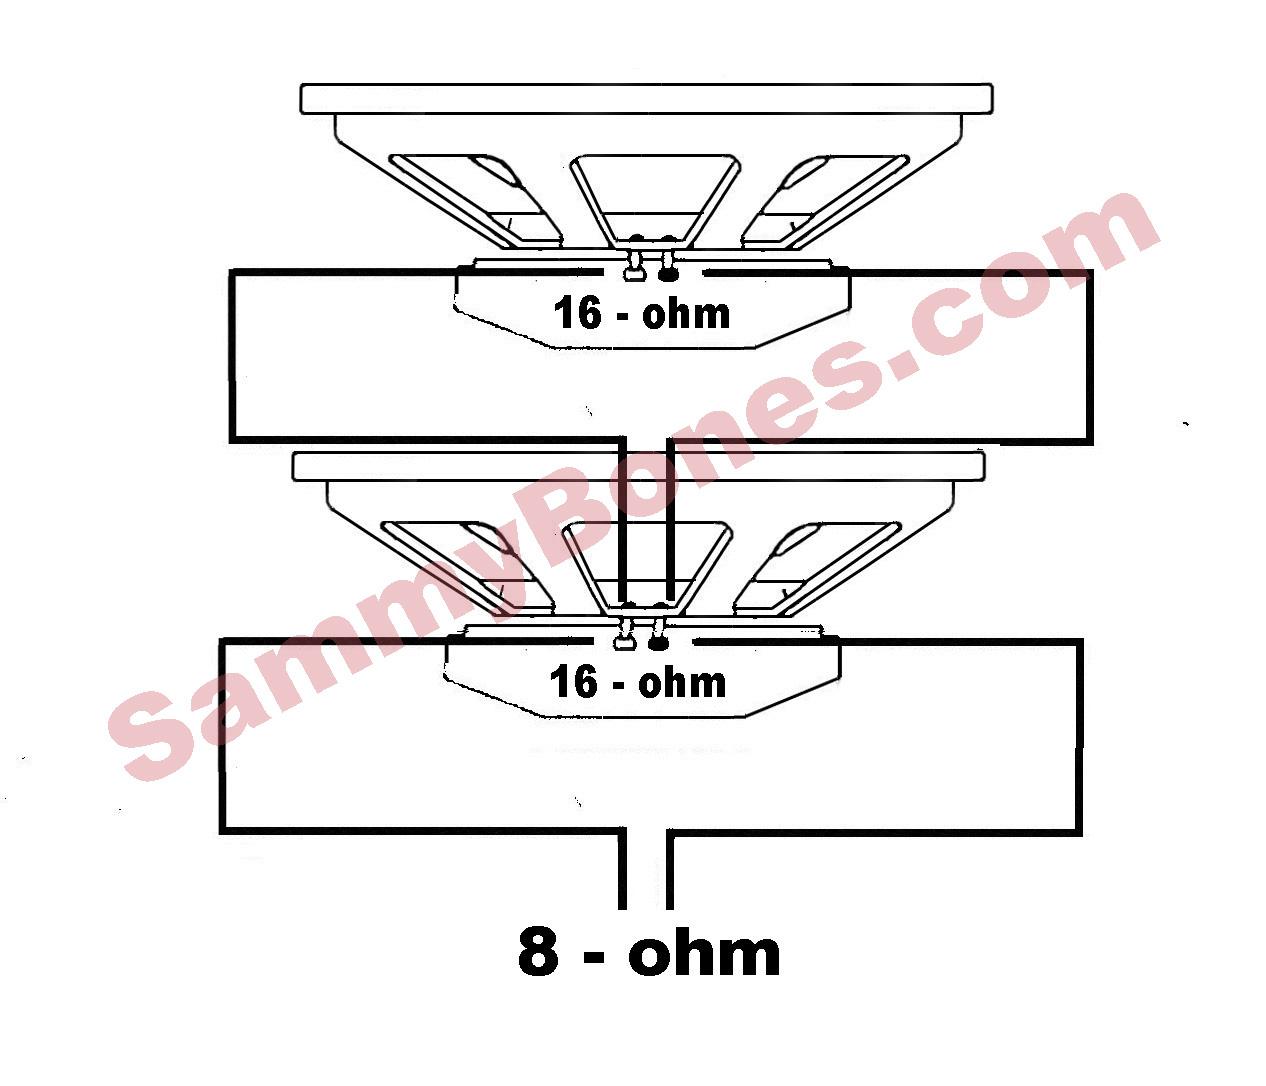 2 Speaker 8 Ohm Wiring Diagram Wire - Wiring Diagrams - Speaker Wiring Diagram